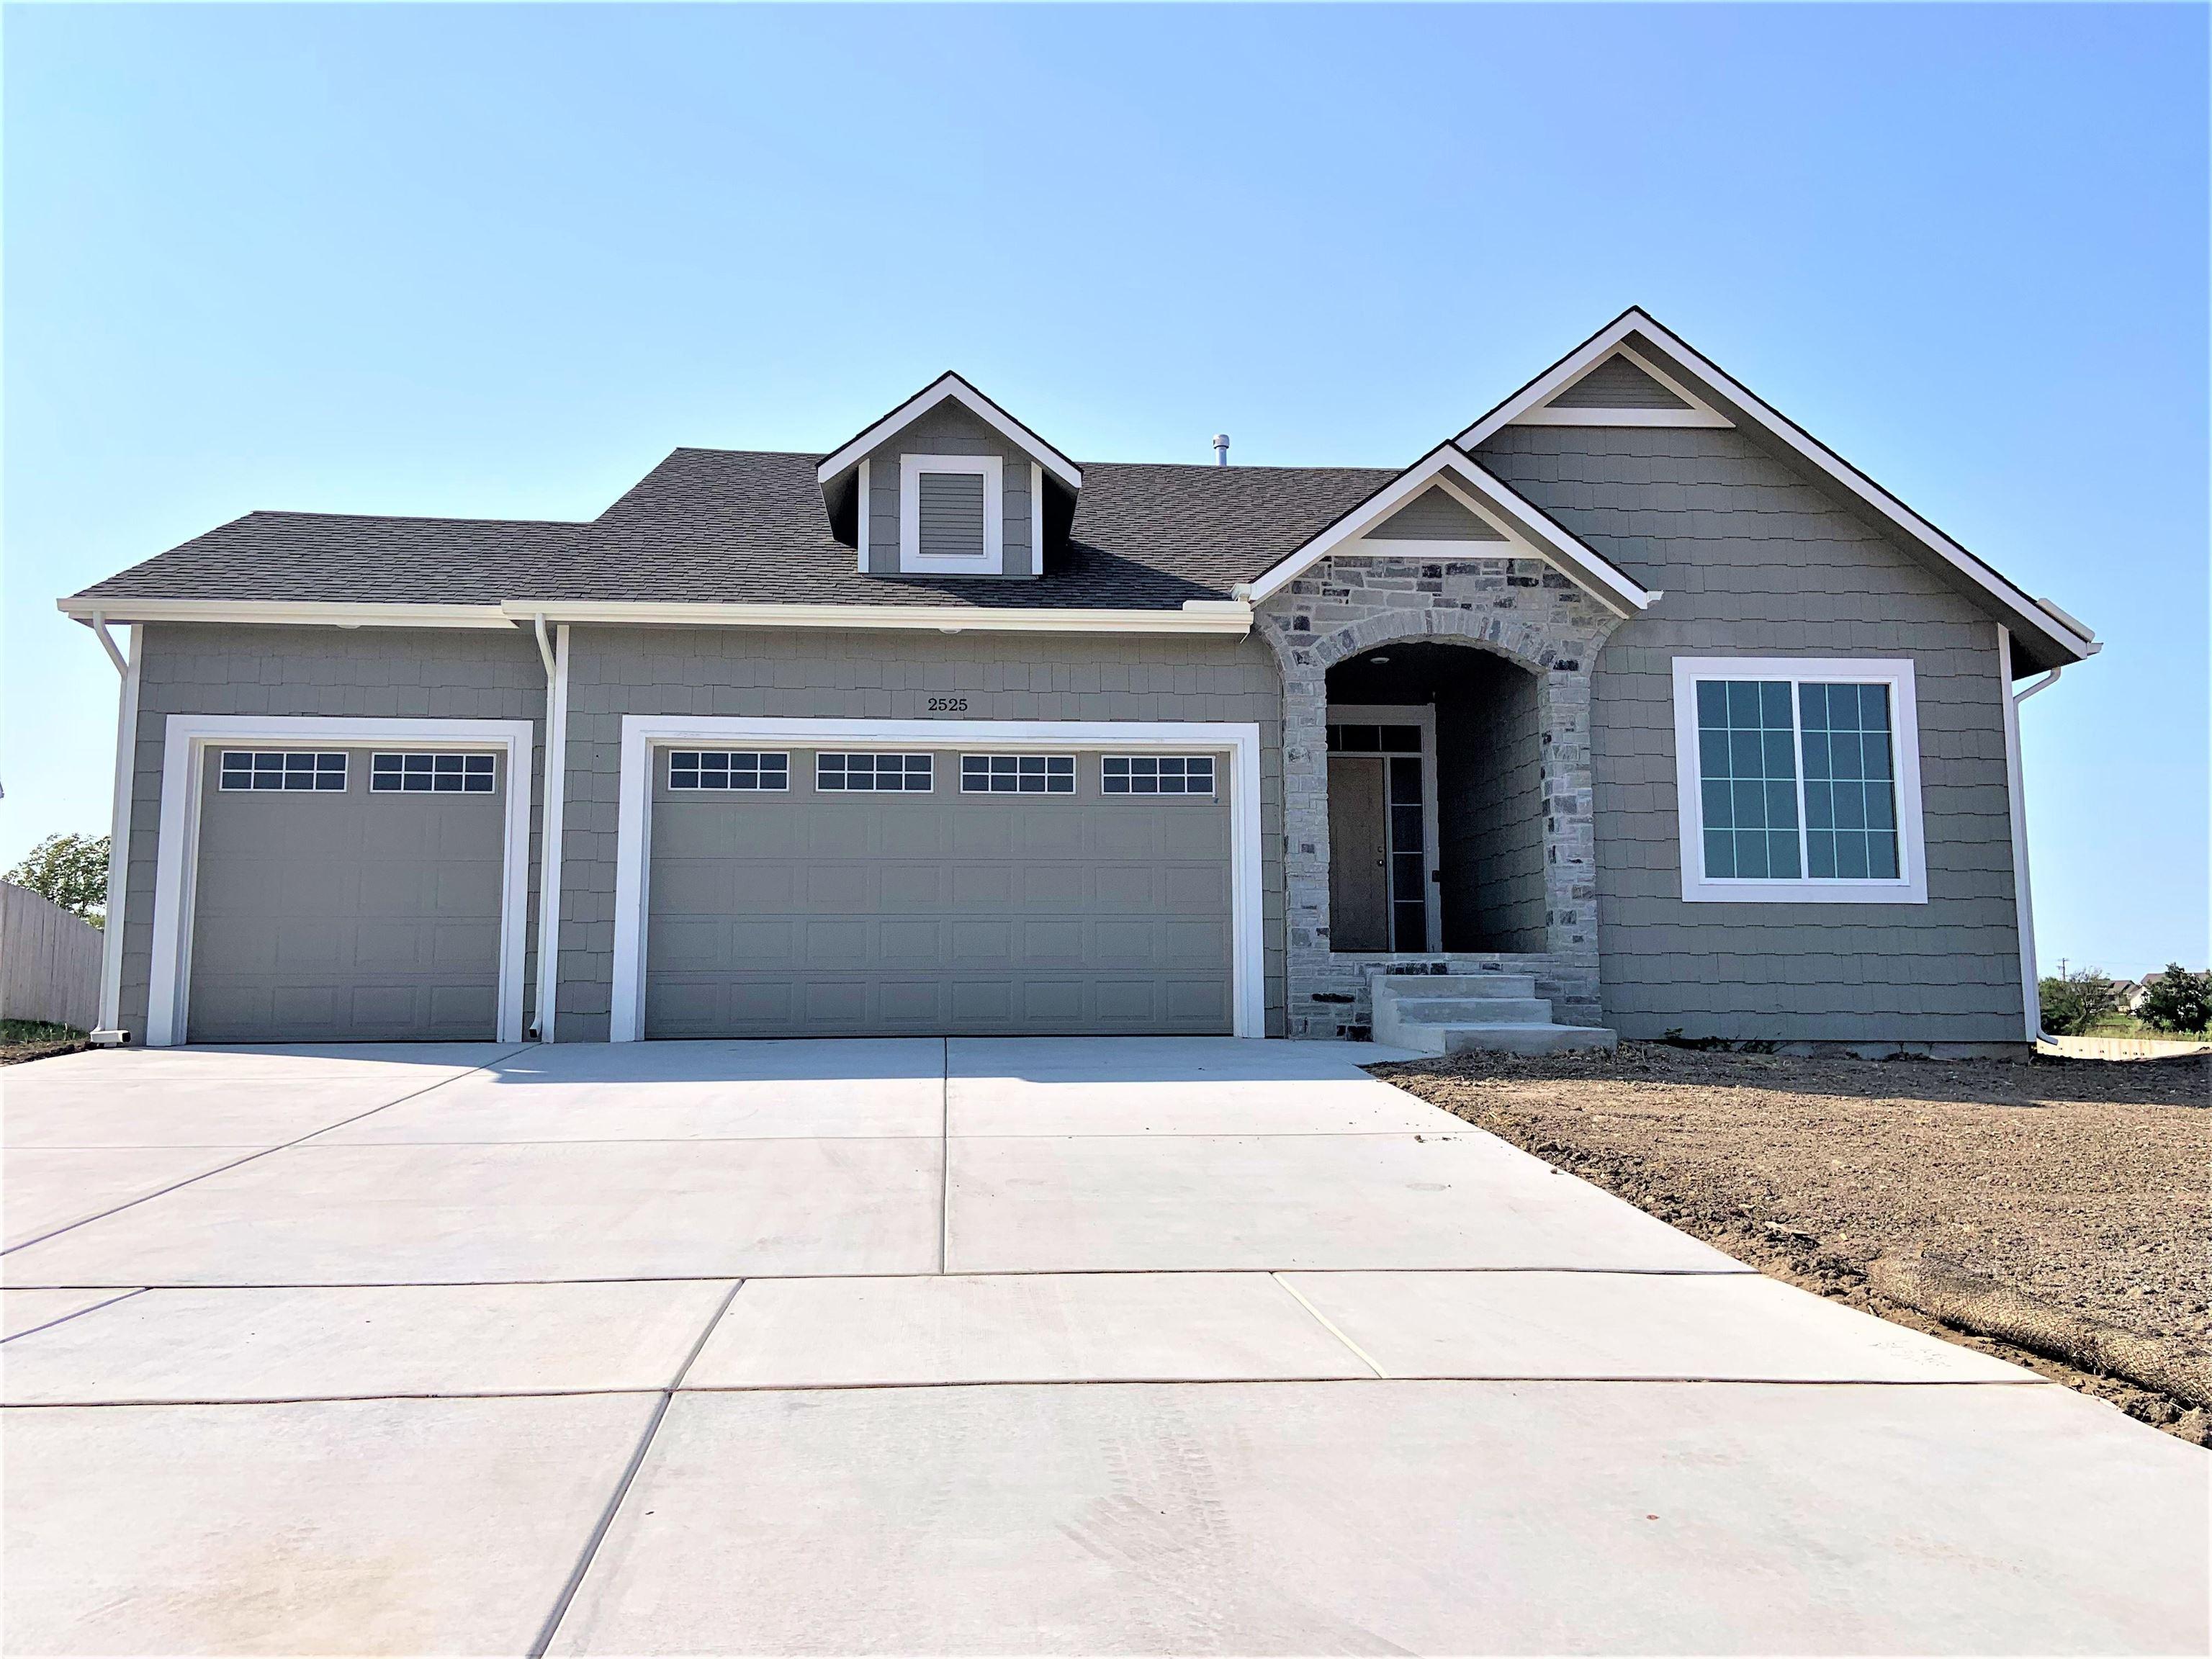 2525 S Spring Hollow St, Wichita, KS, 67230